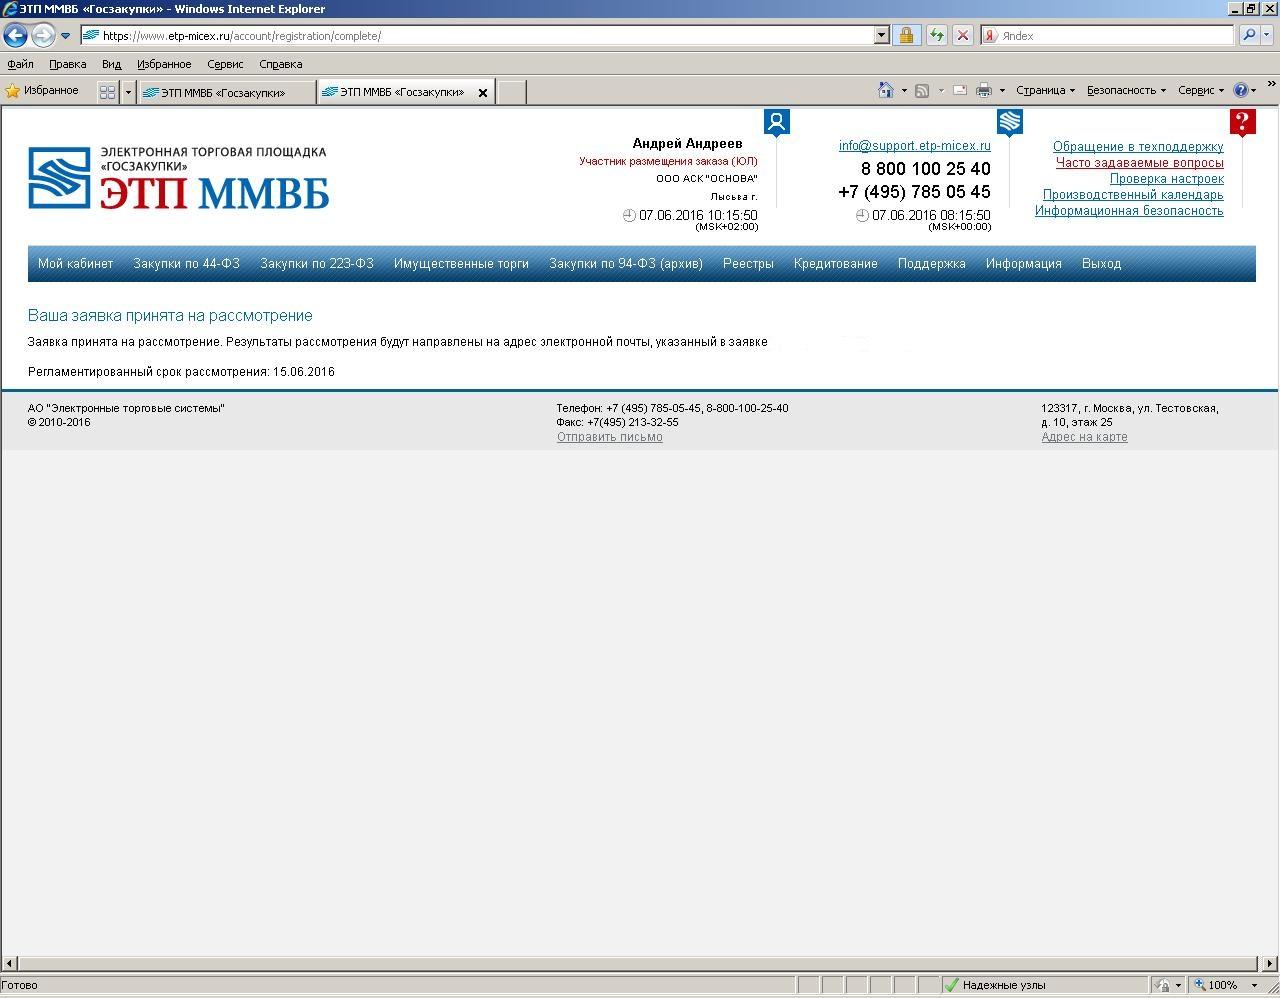 заявка принята ммвб 44 фз